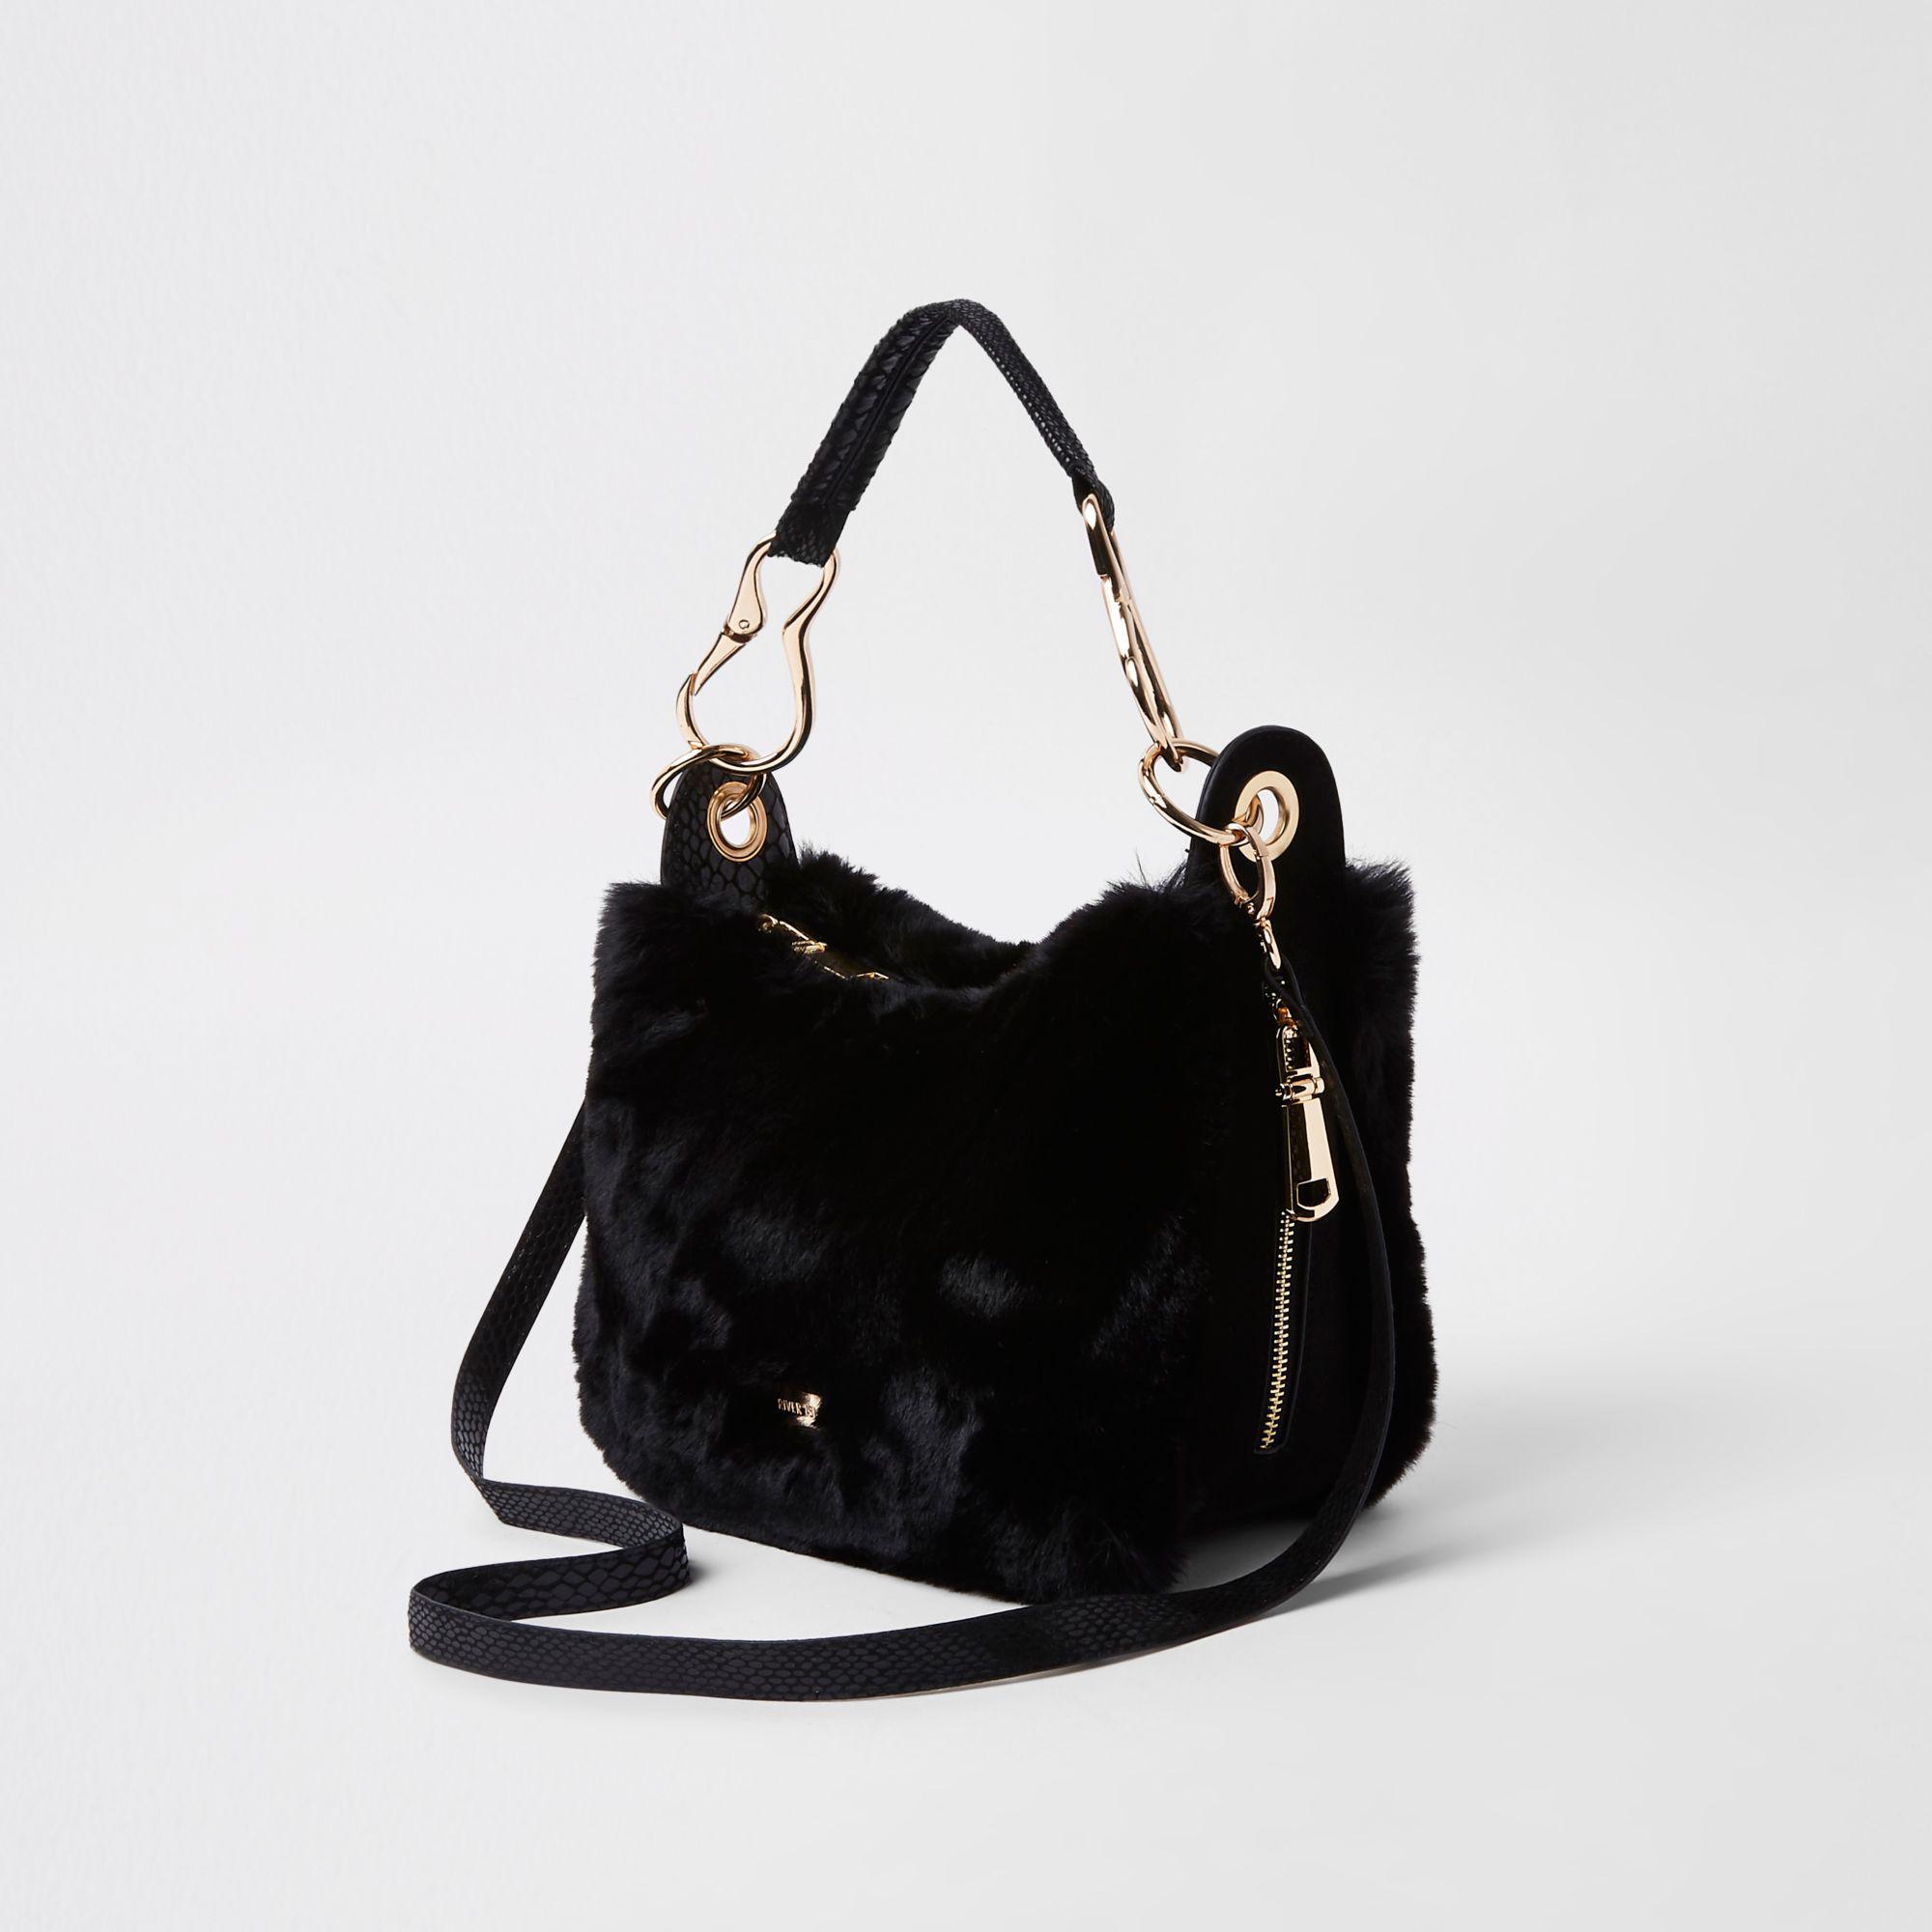 39ed40b52f Lyst - River Island Black Zip Faux Fur Scoop Cross Body Bag in Black